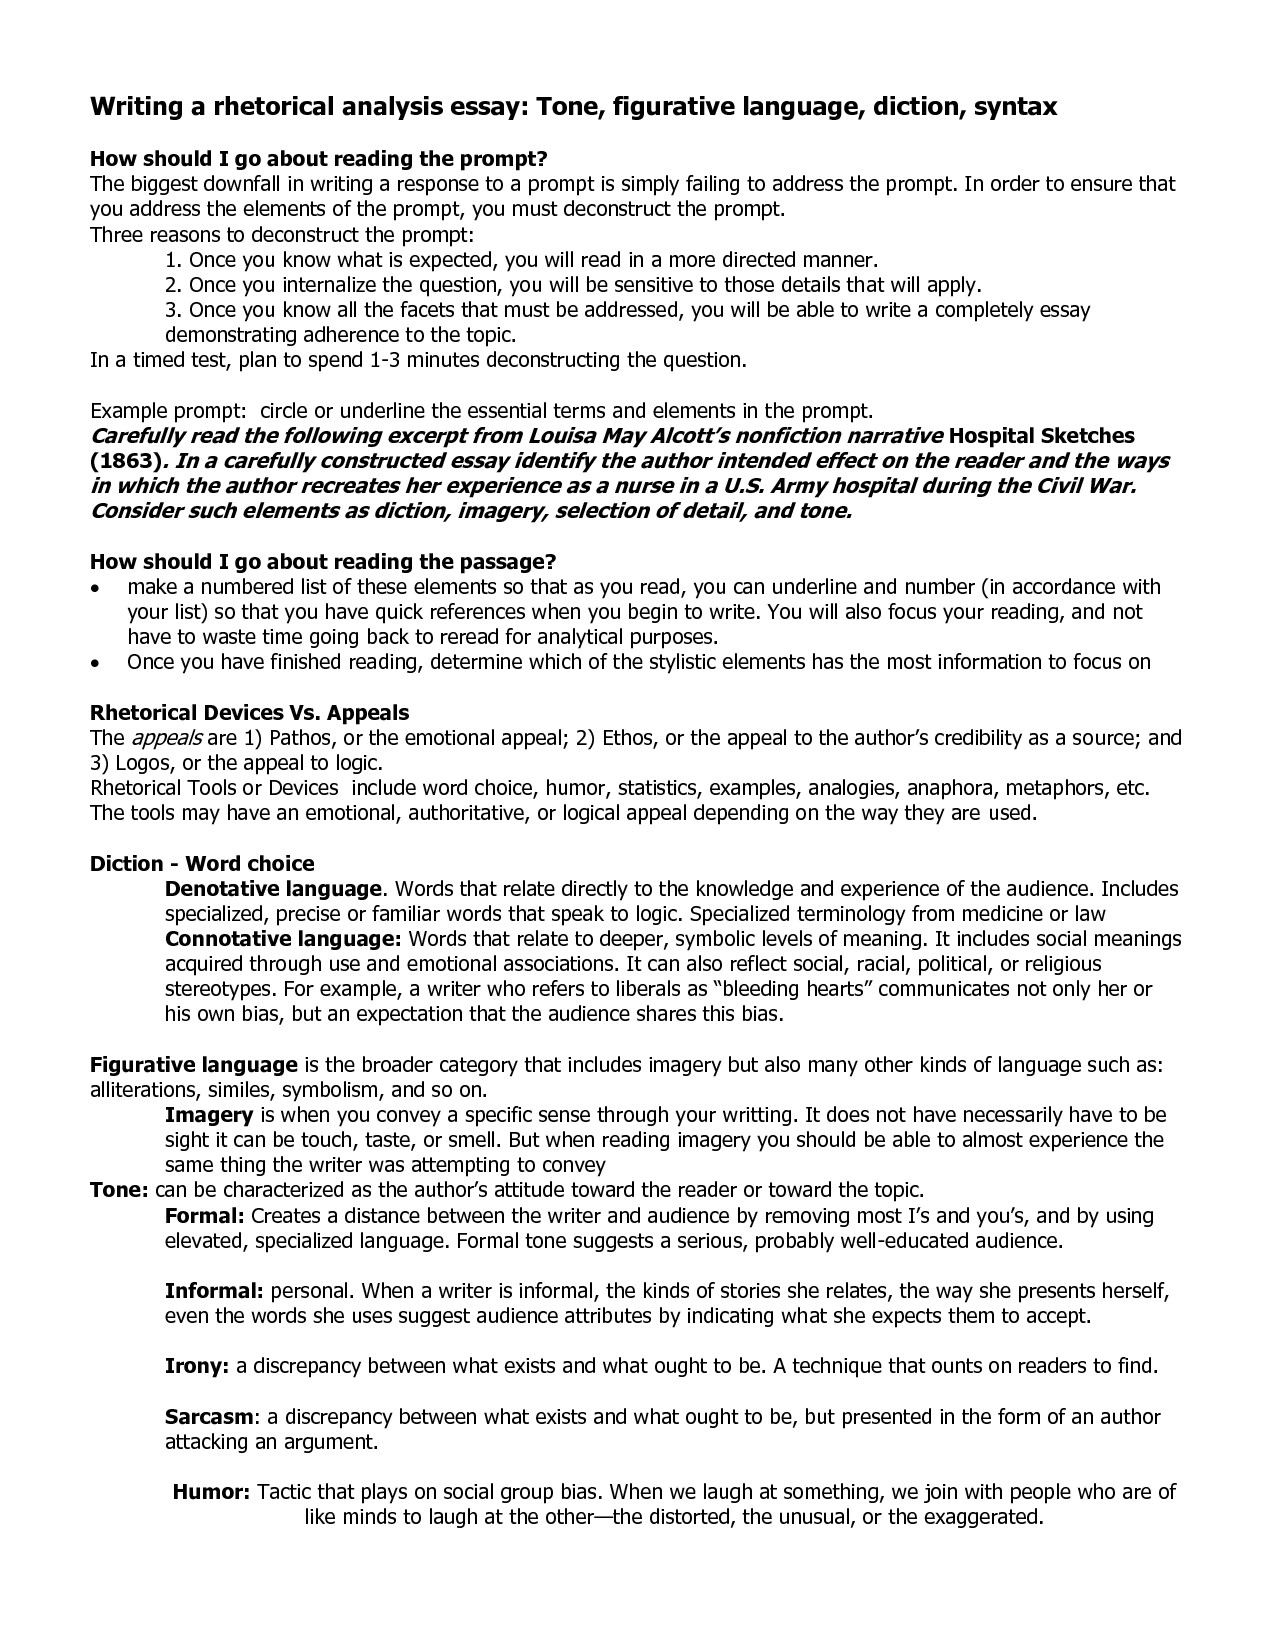 004 4v5jglfvmn Essay Example Check My Top Free For Punctuation Errors Plagiarism Mac Paper Full